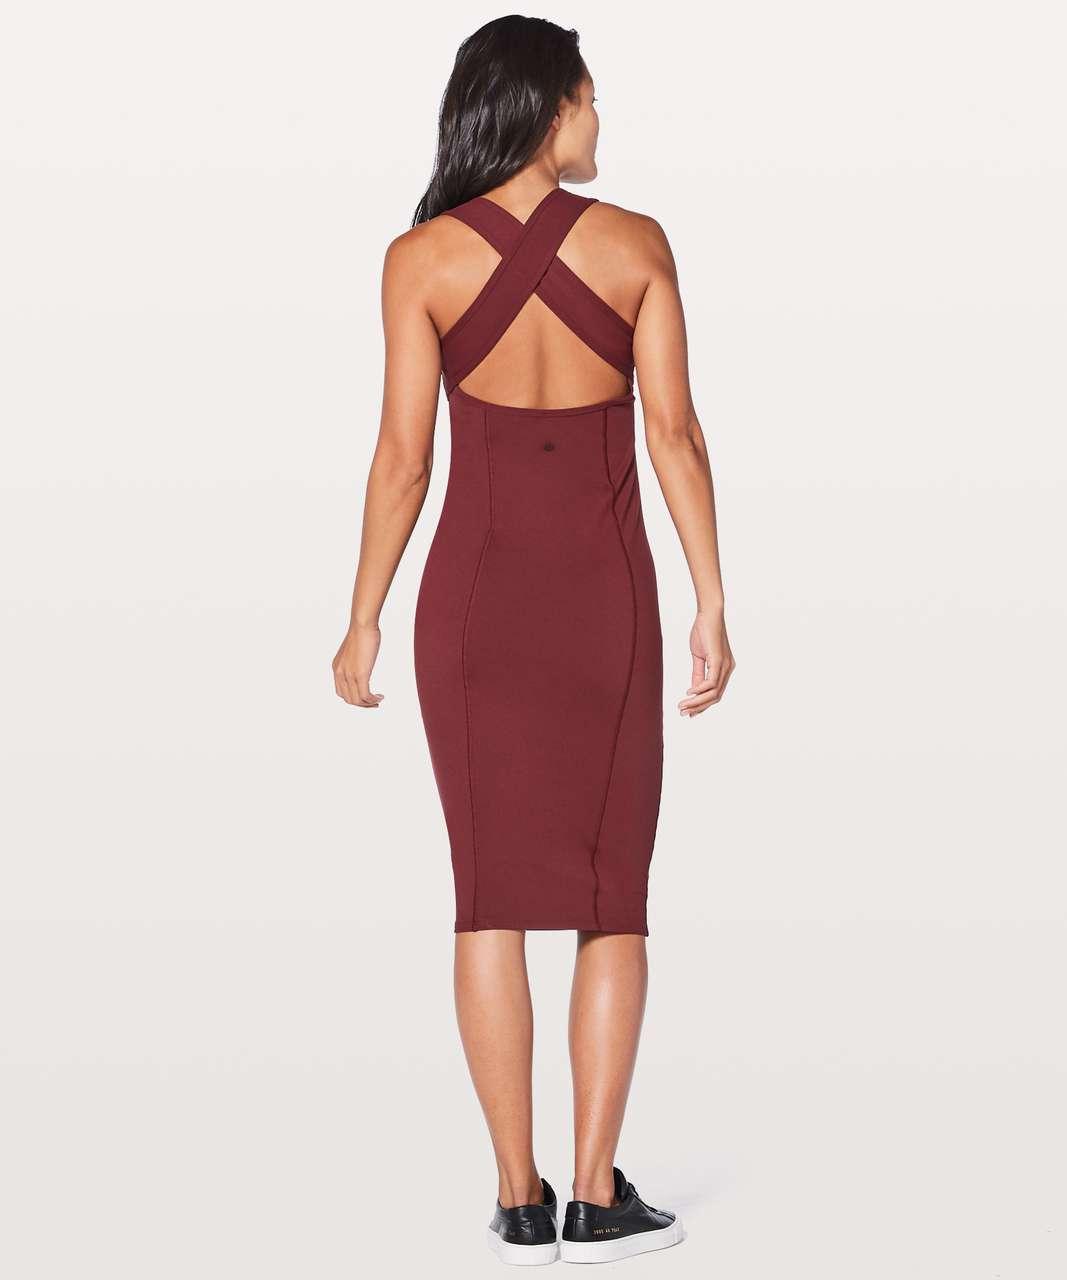 900d5e7c52 Lululemon Picnic Play Dress - Deep Rouge - lulu fanatics